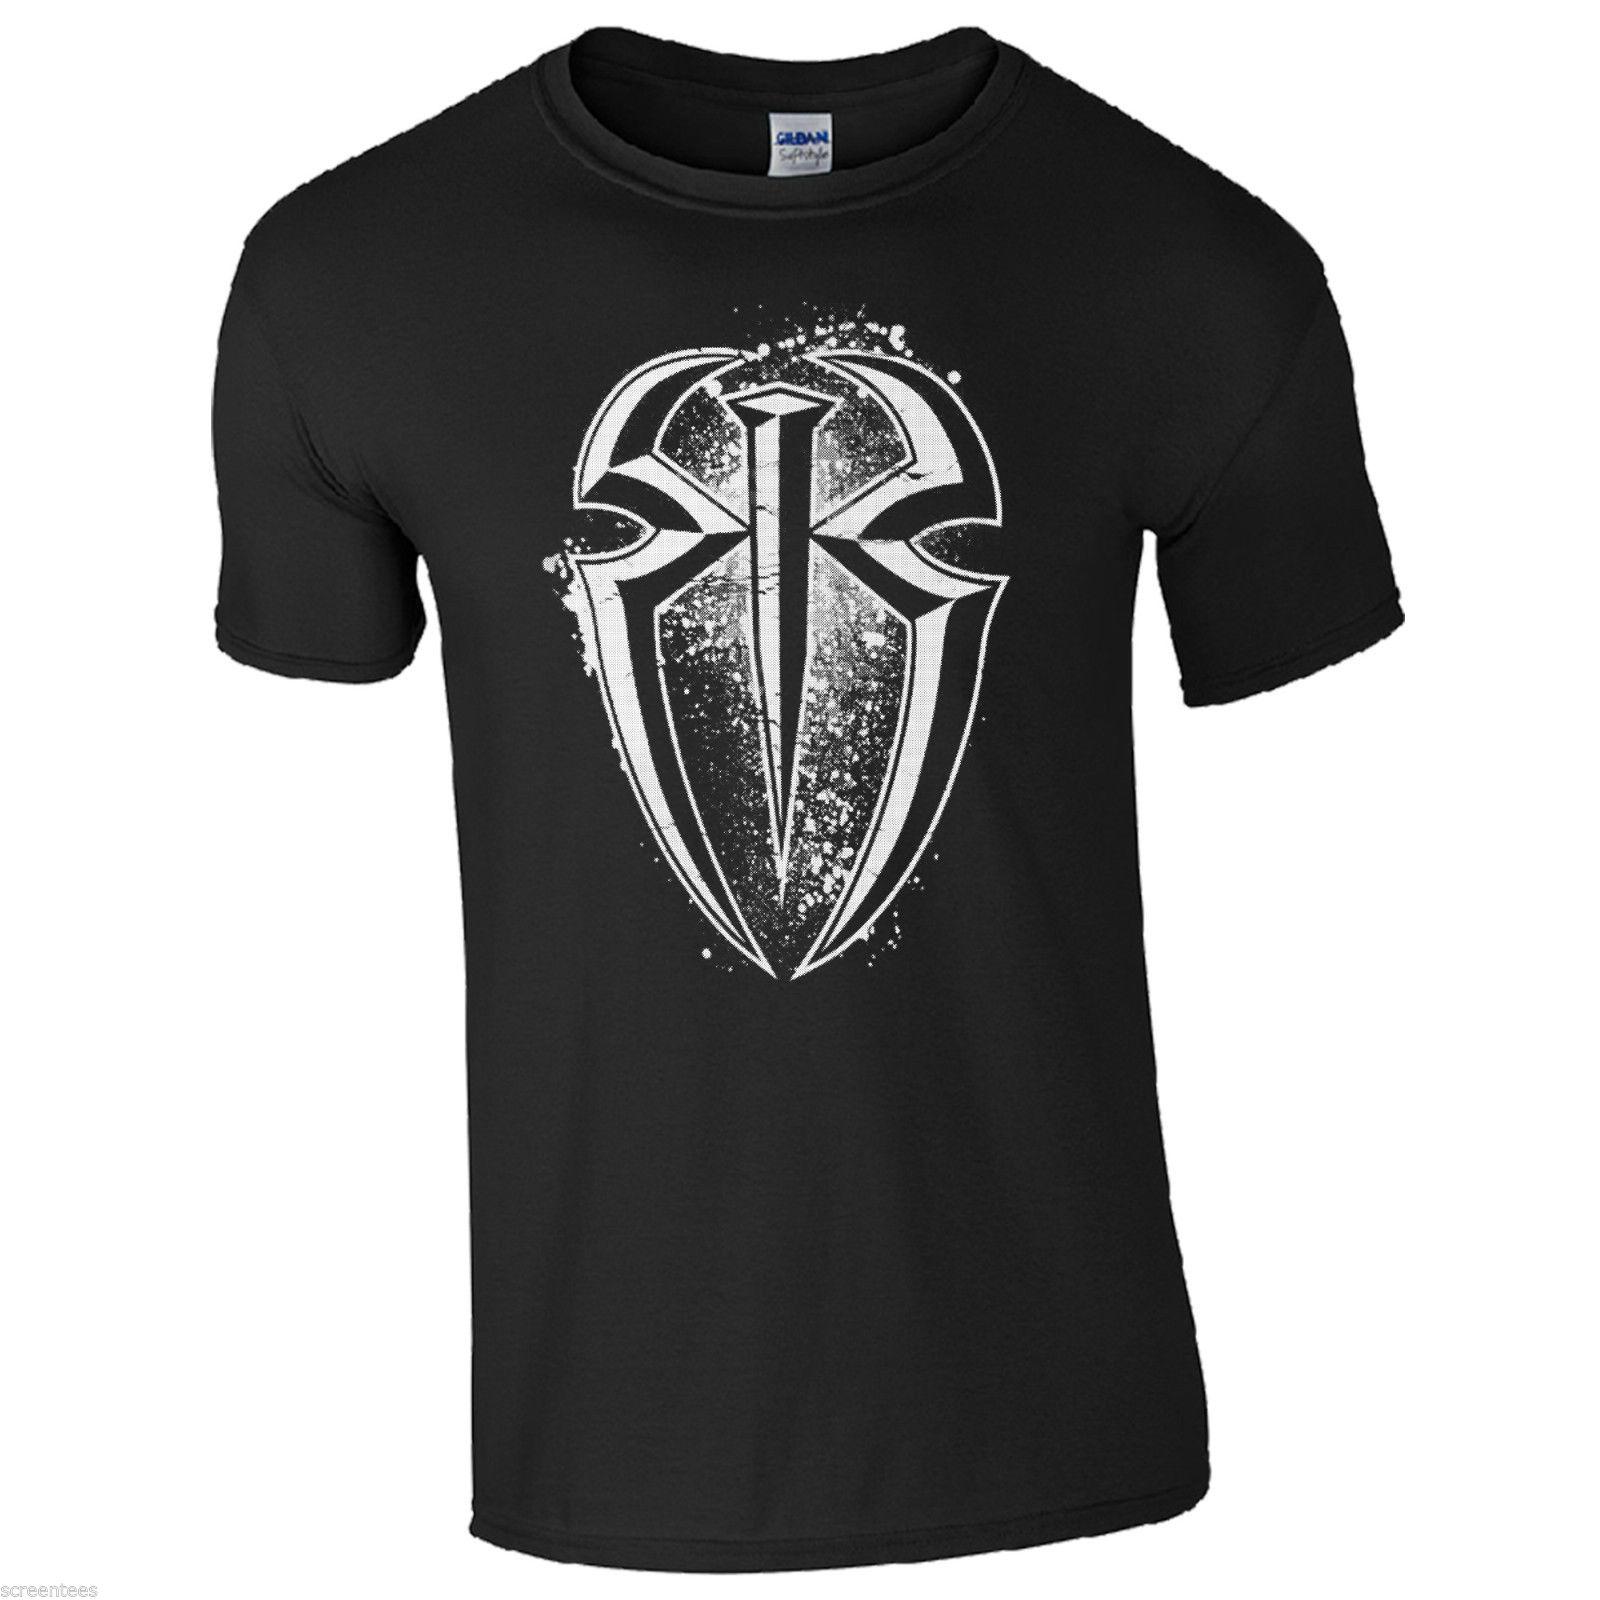 RR T-Shirt - Wrestler Roman Reigns Fan Inspired Unisex Kids …